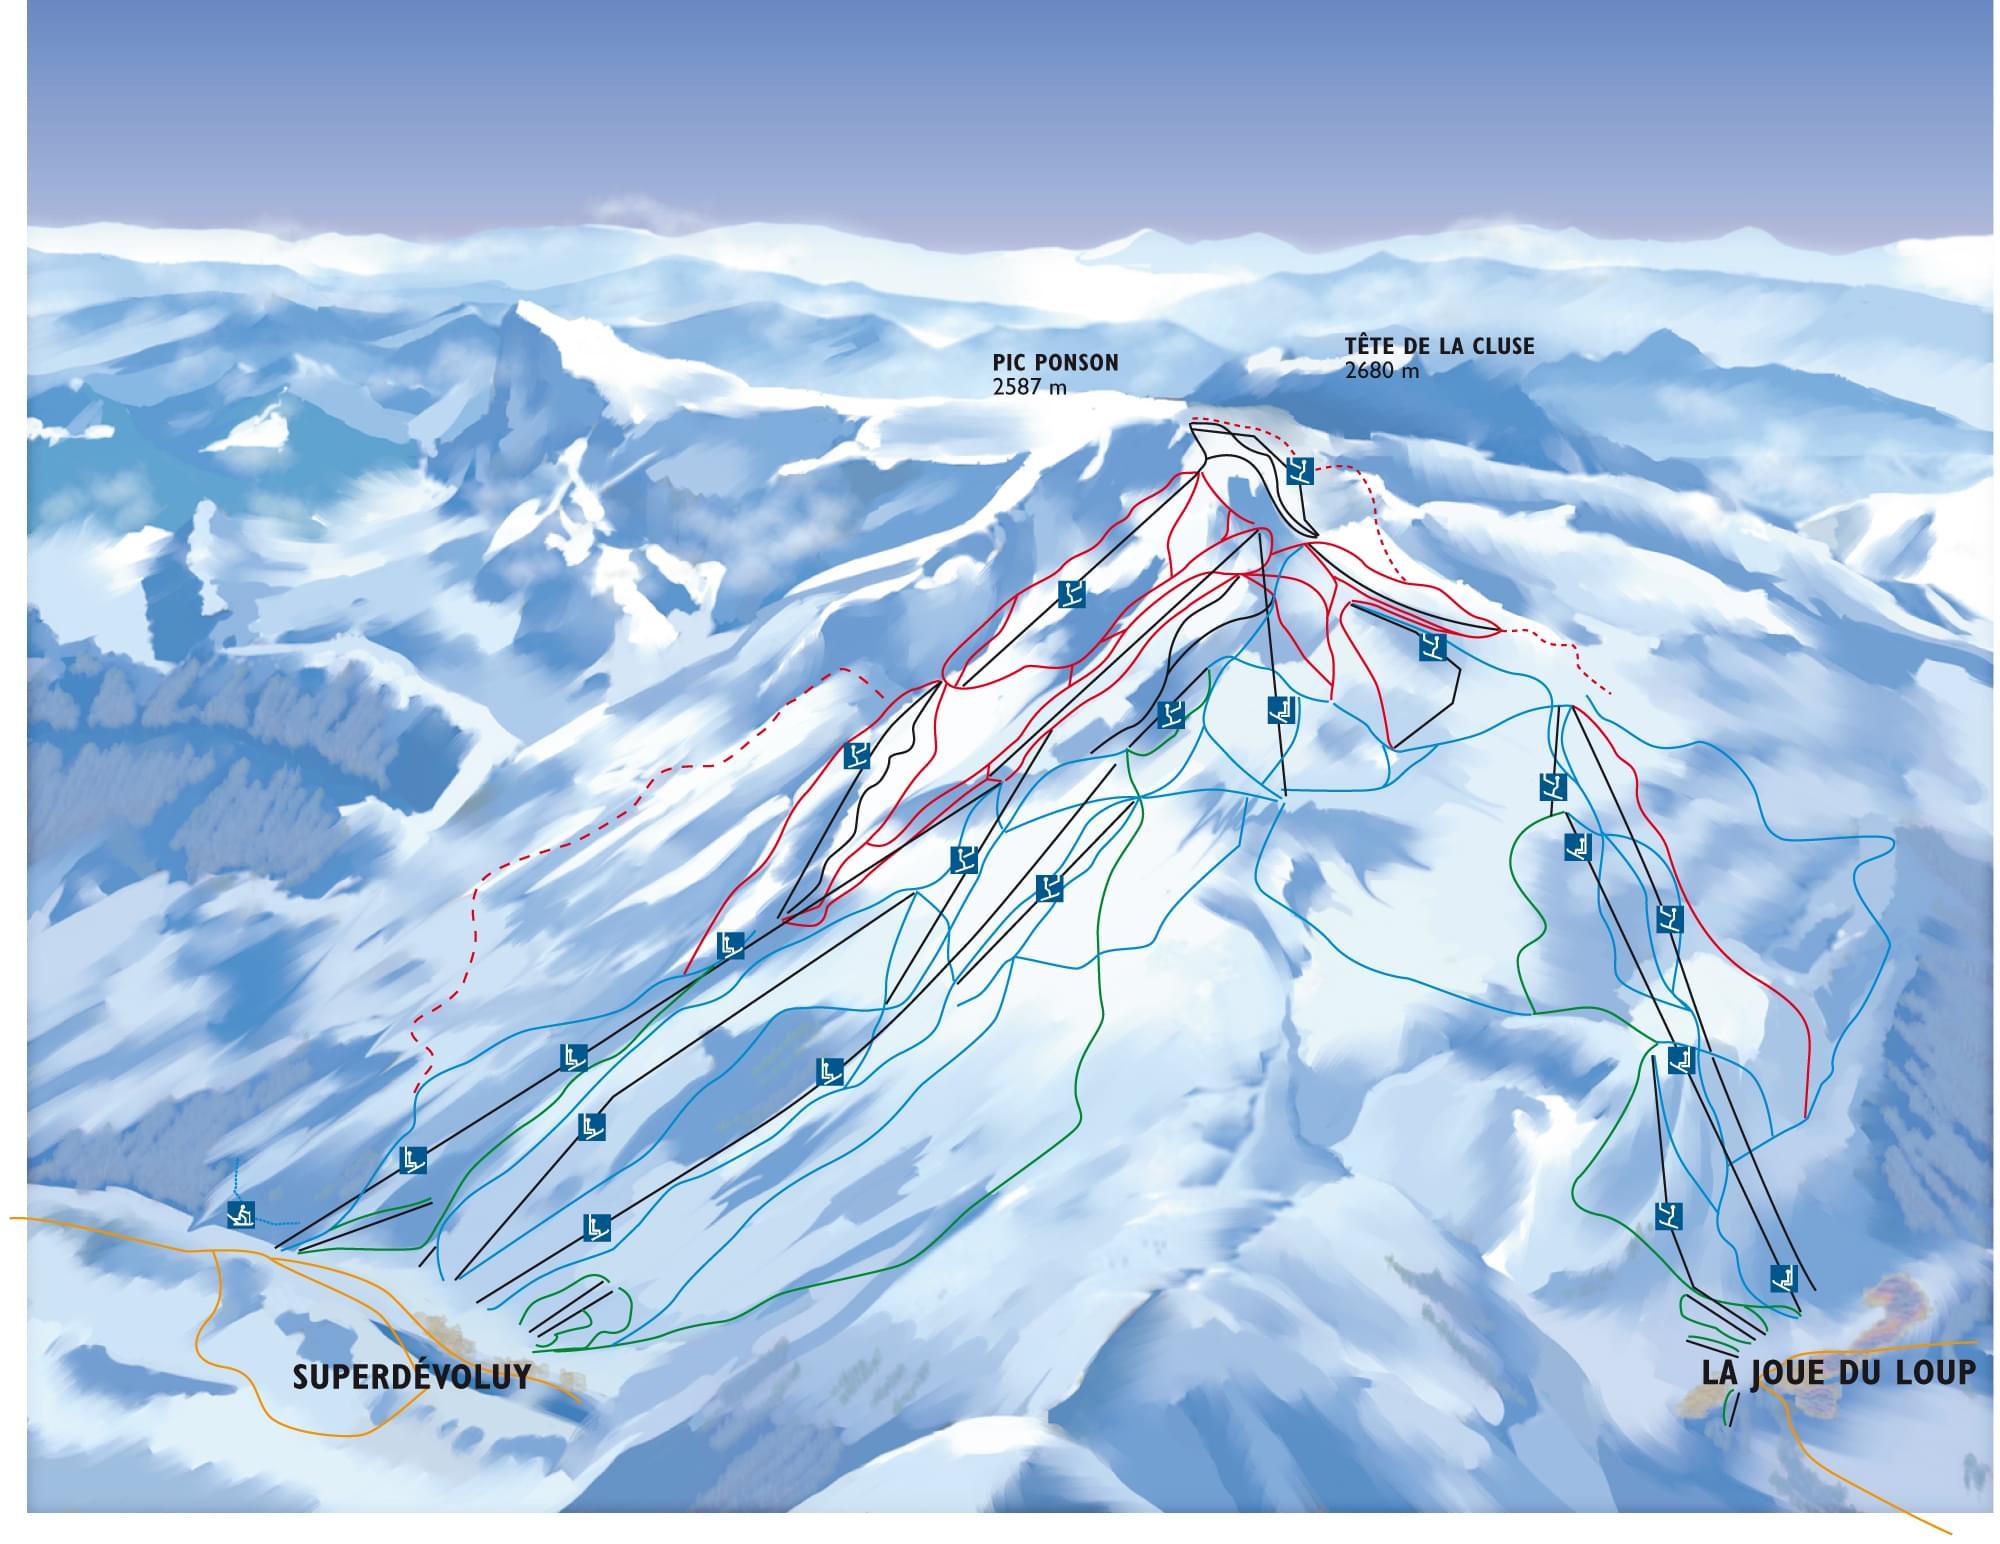 Dévoluy Piste / Trail Map